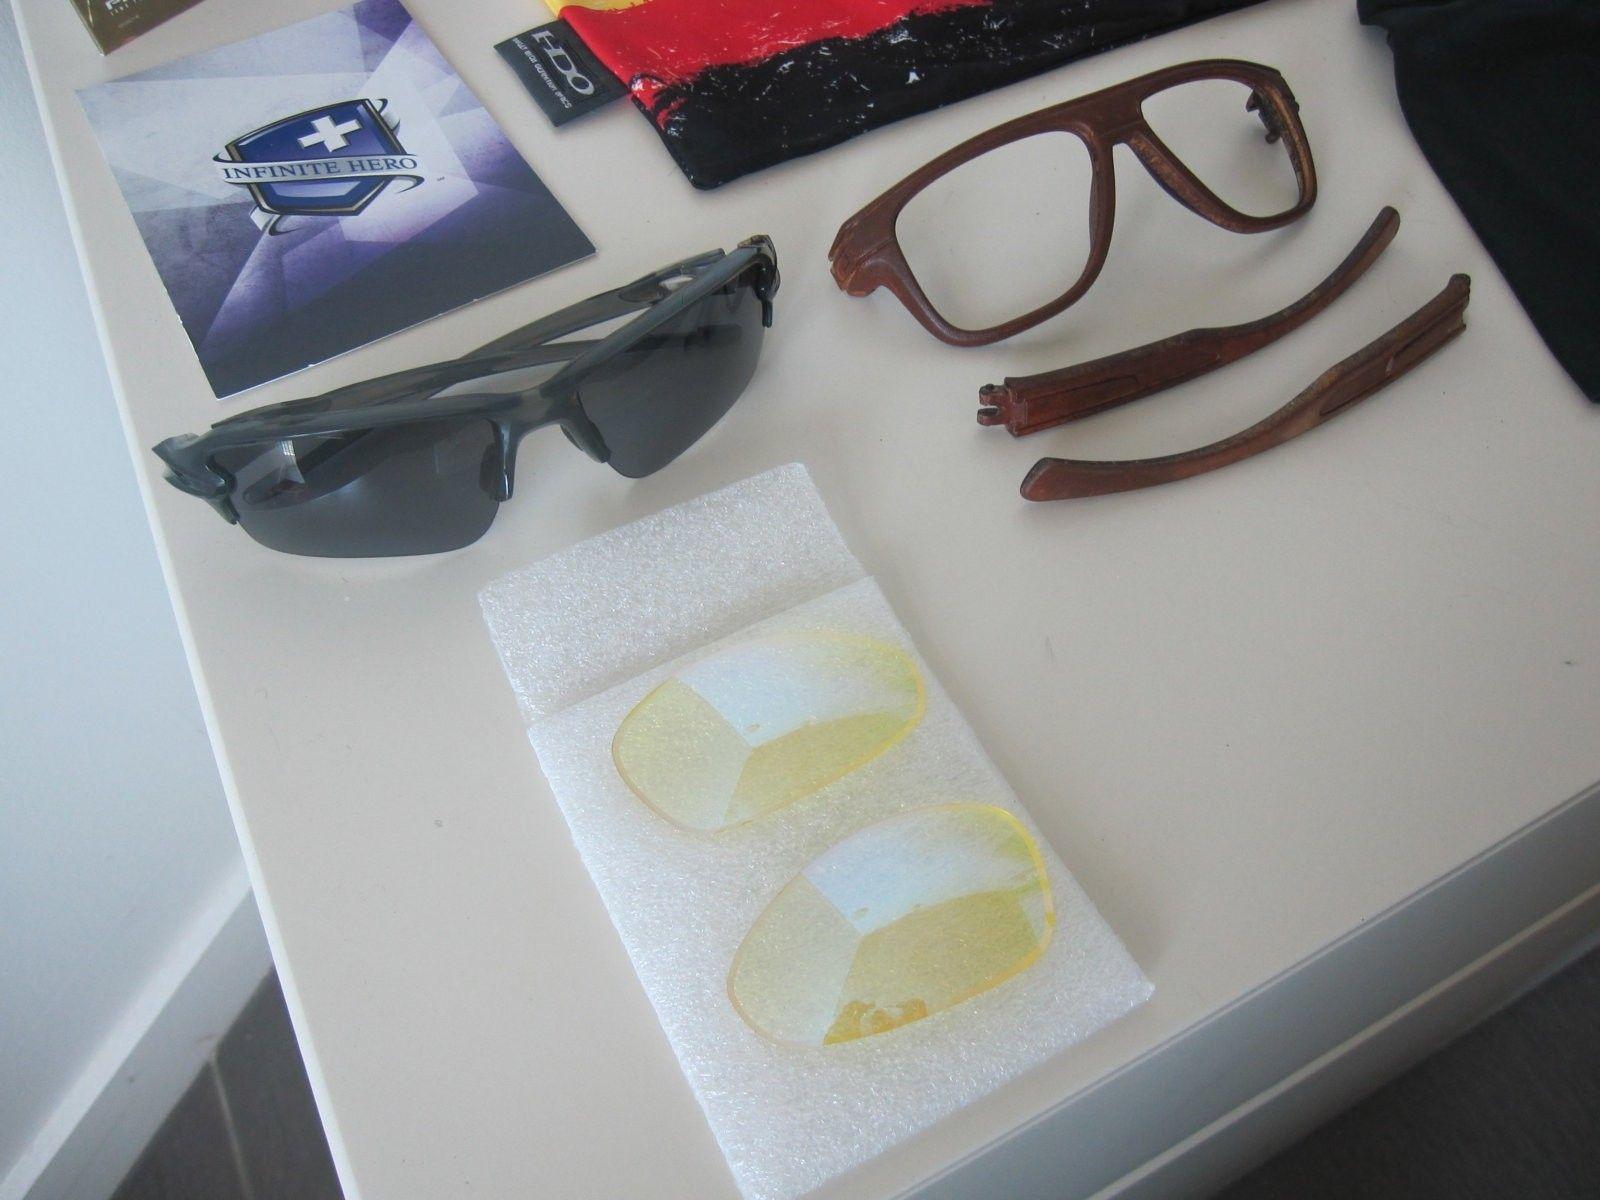 Oakley mini bundle - 2 frames and other stuff - GONE - IMG_5636.JPG